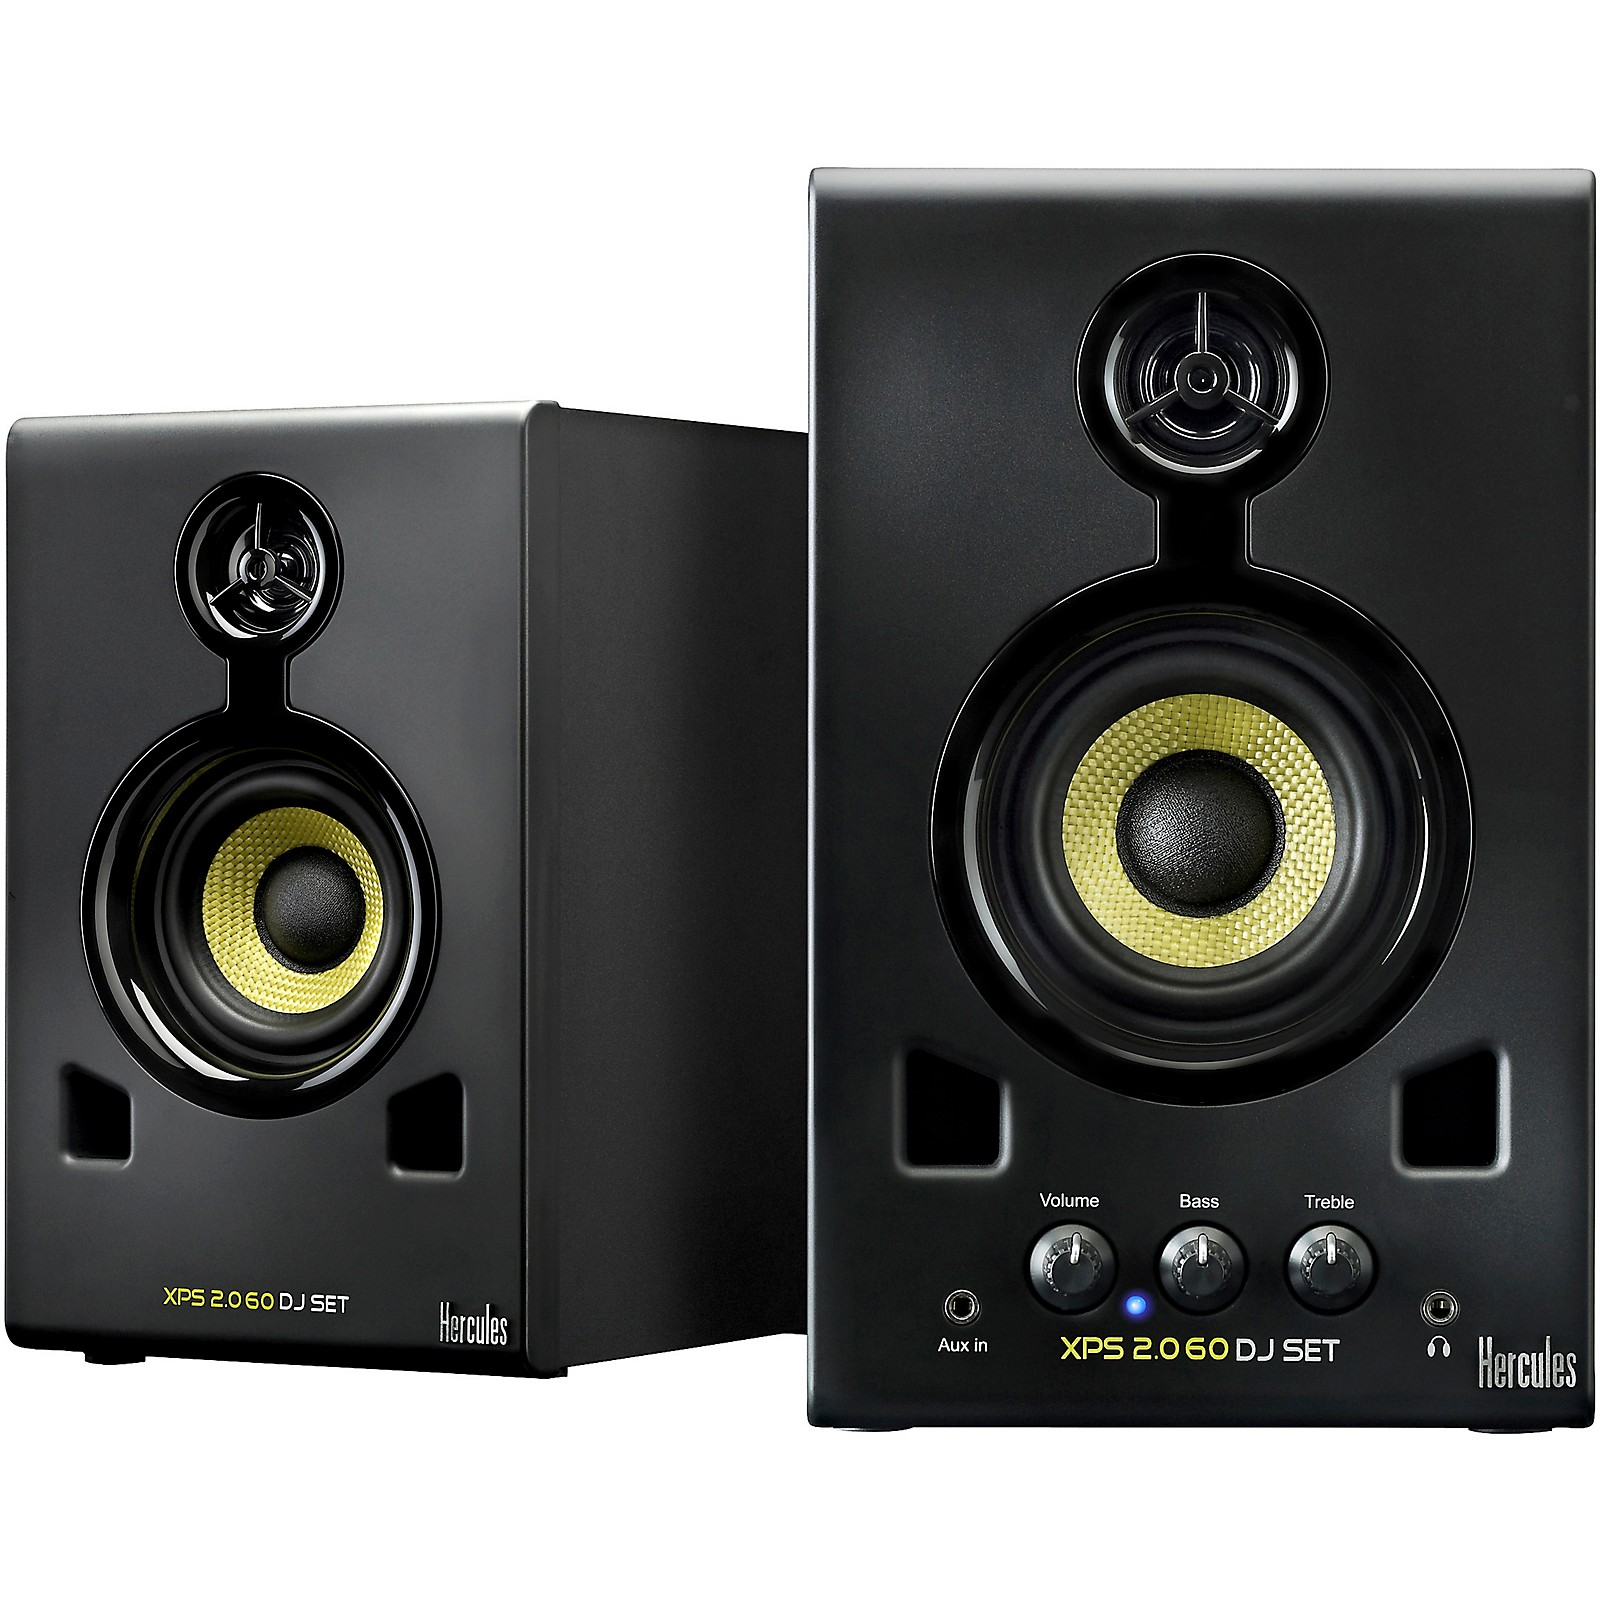 Hercules DJ XPS 2.0 60 DJ Multimedia Speakers